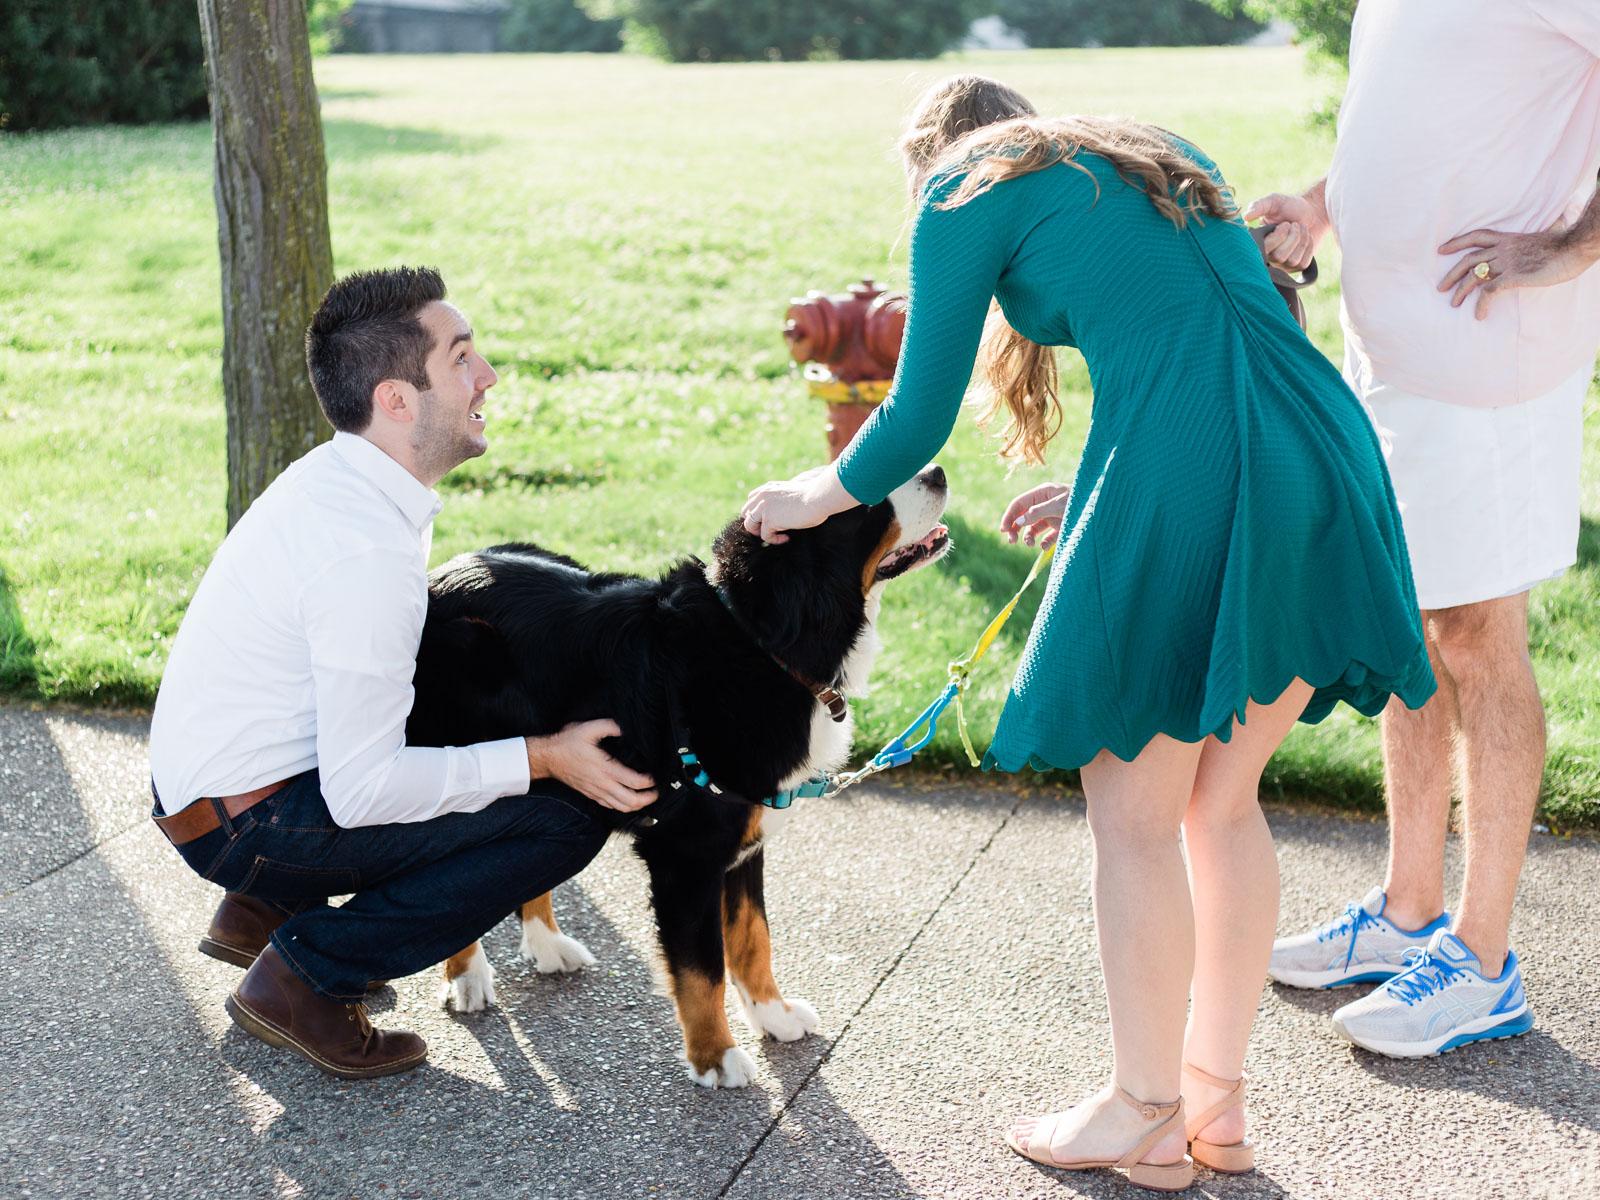 Romantic Chicago Engagement Photos at Milton Lee Olive Park by Matt Erickson Photography-12.jpg